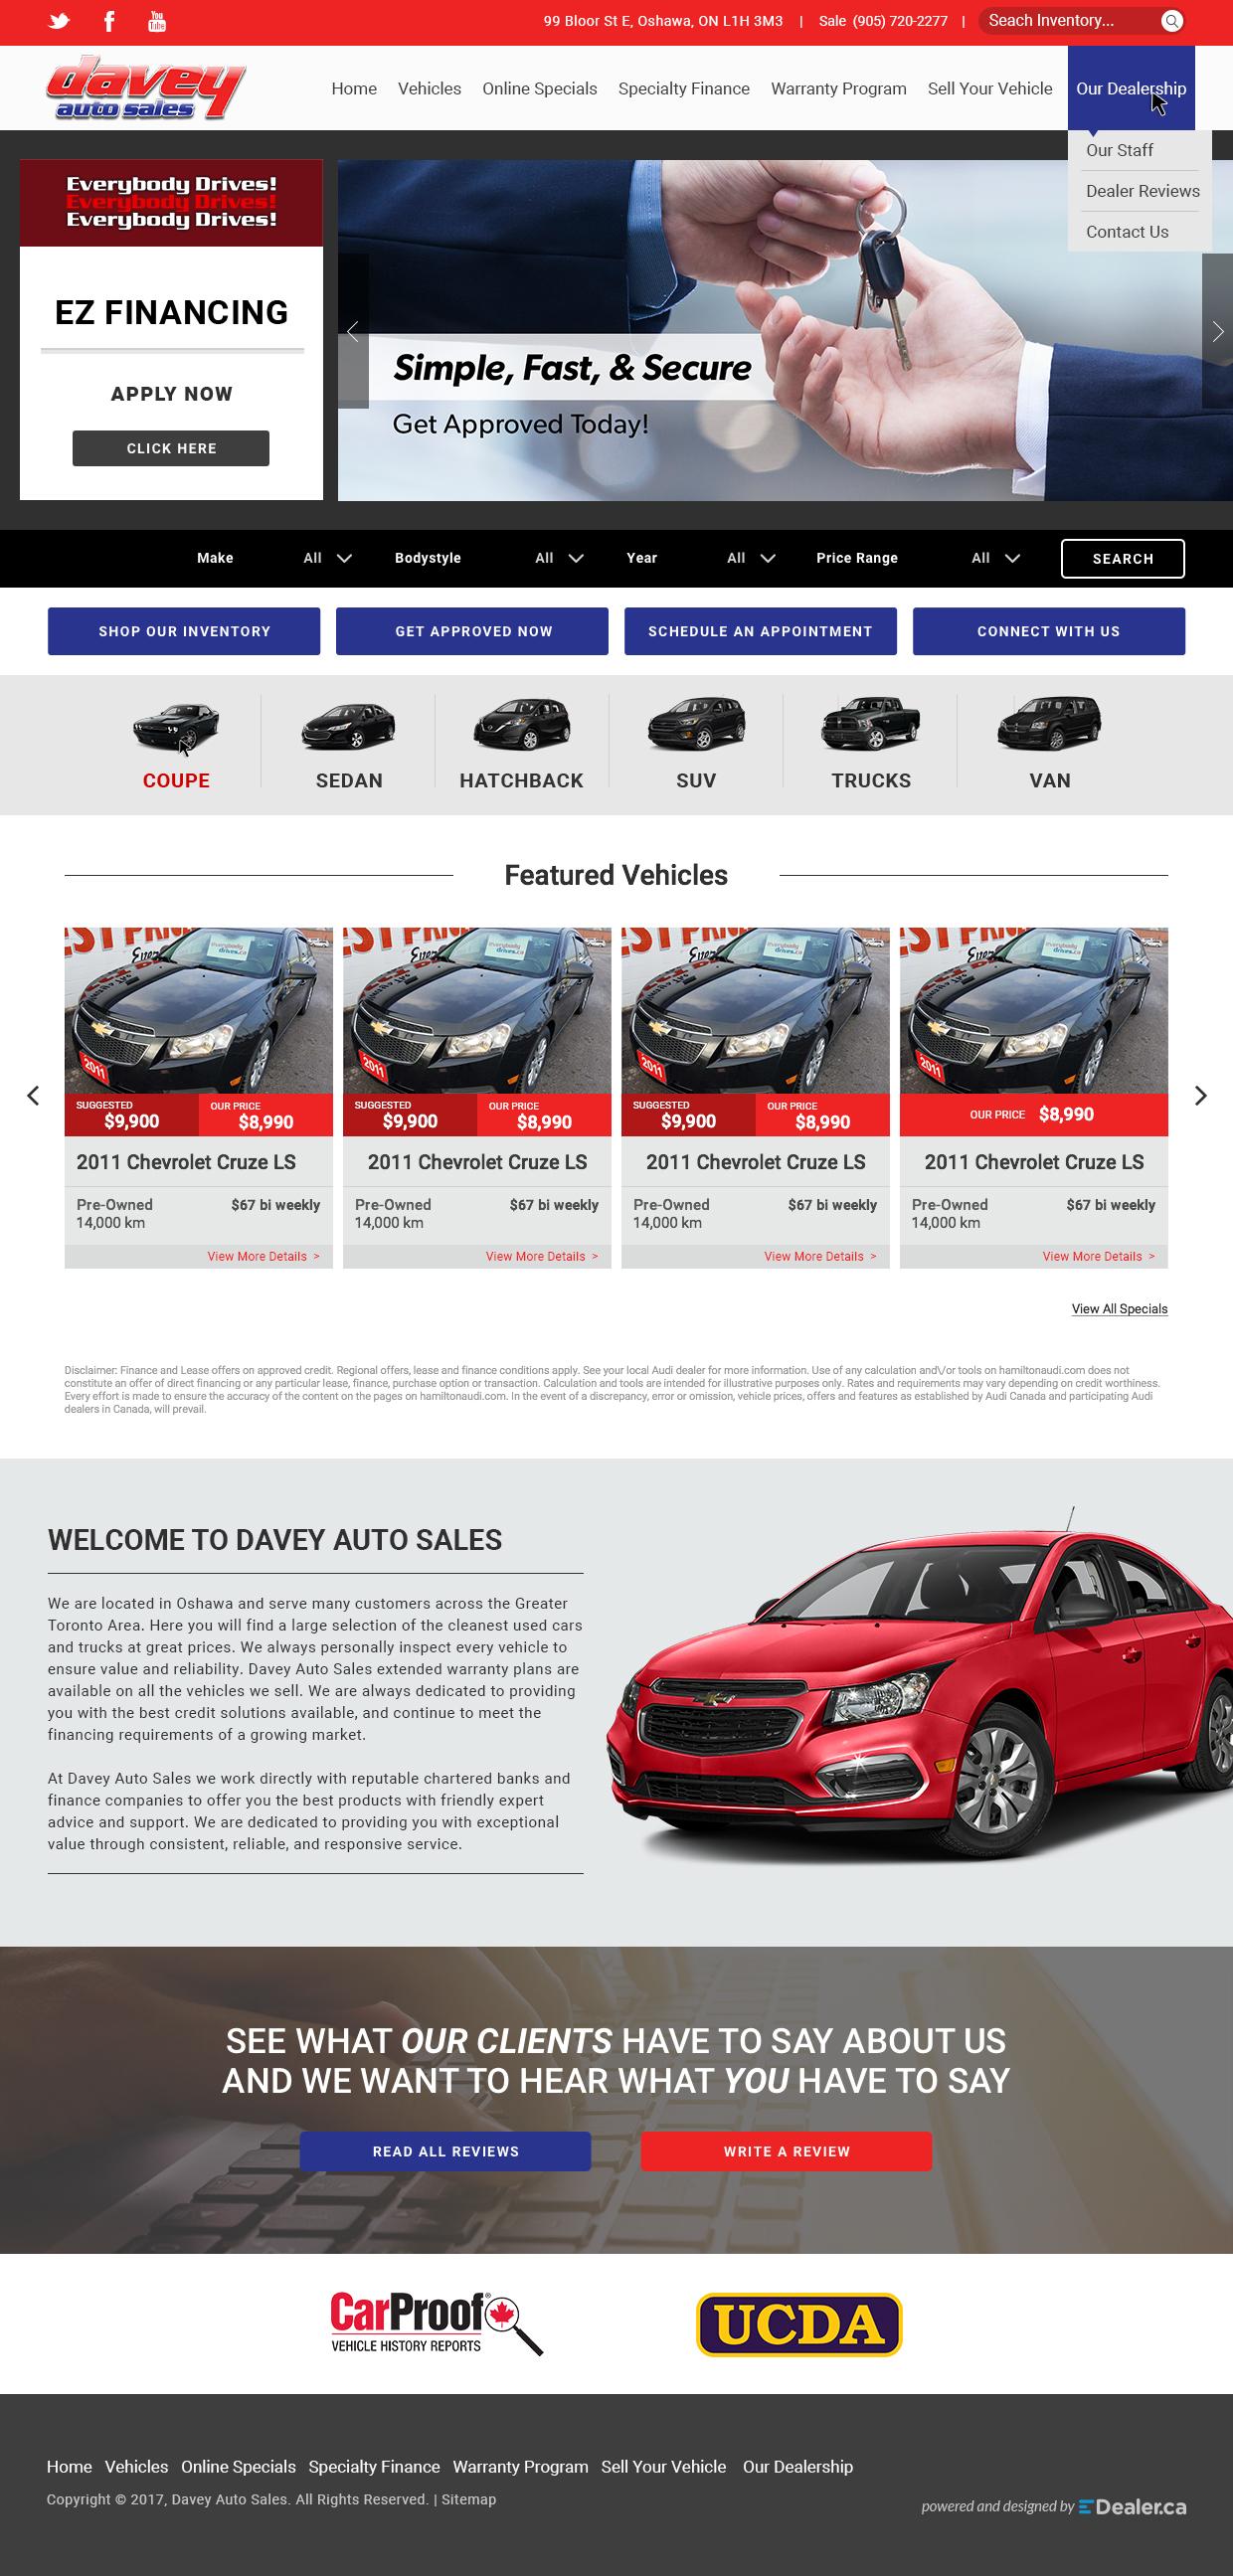 Davey-Auto-Sales-1240px